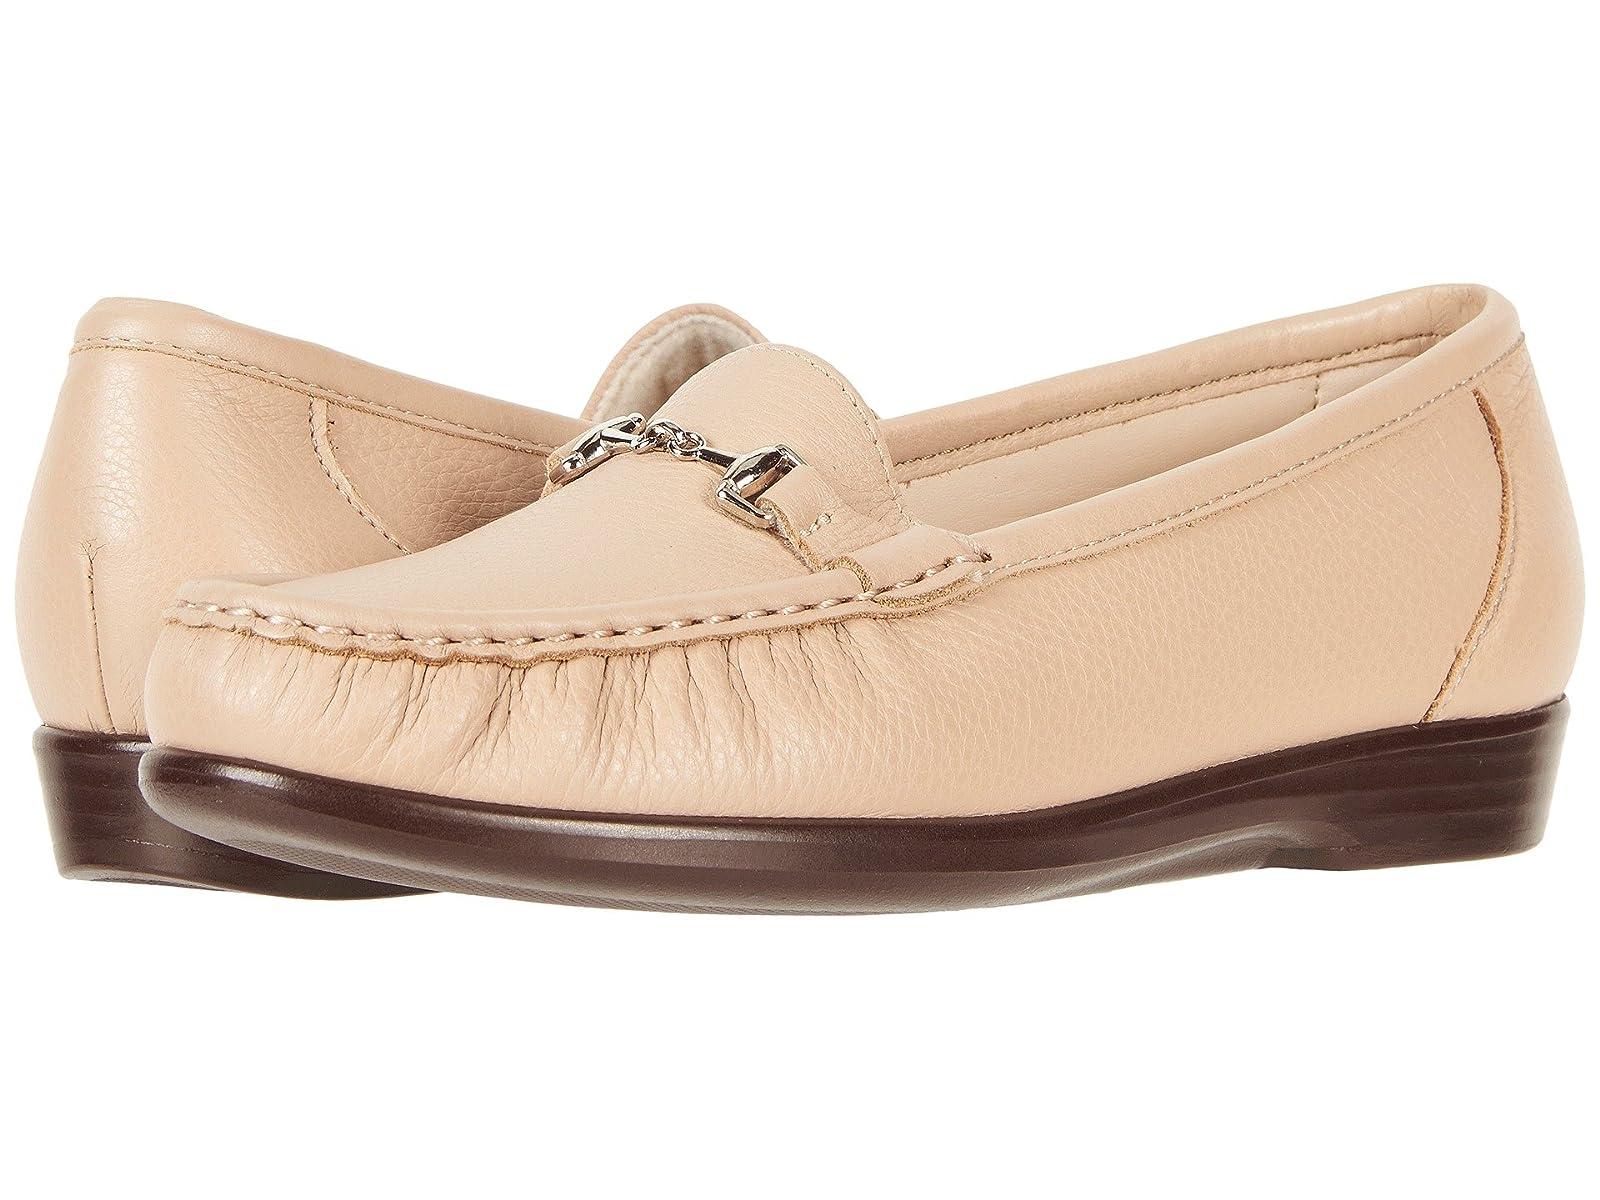 SAS MetroCheap and distinctive eye-catching shoes